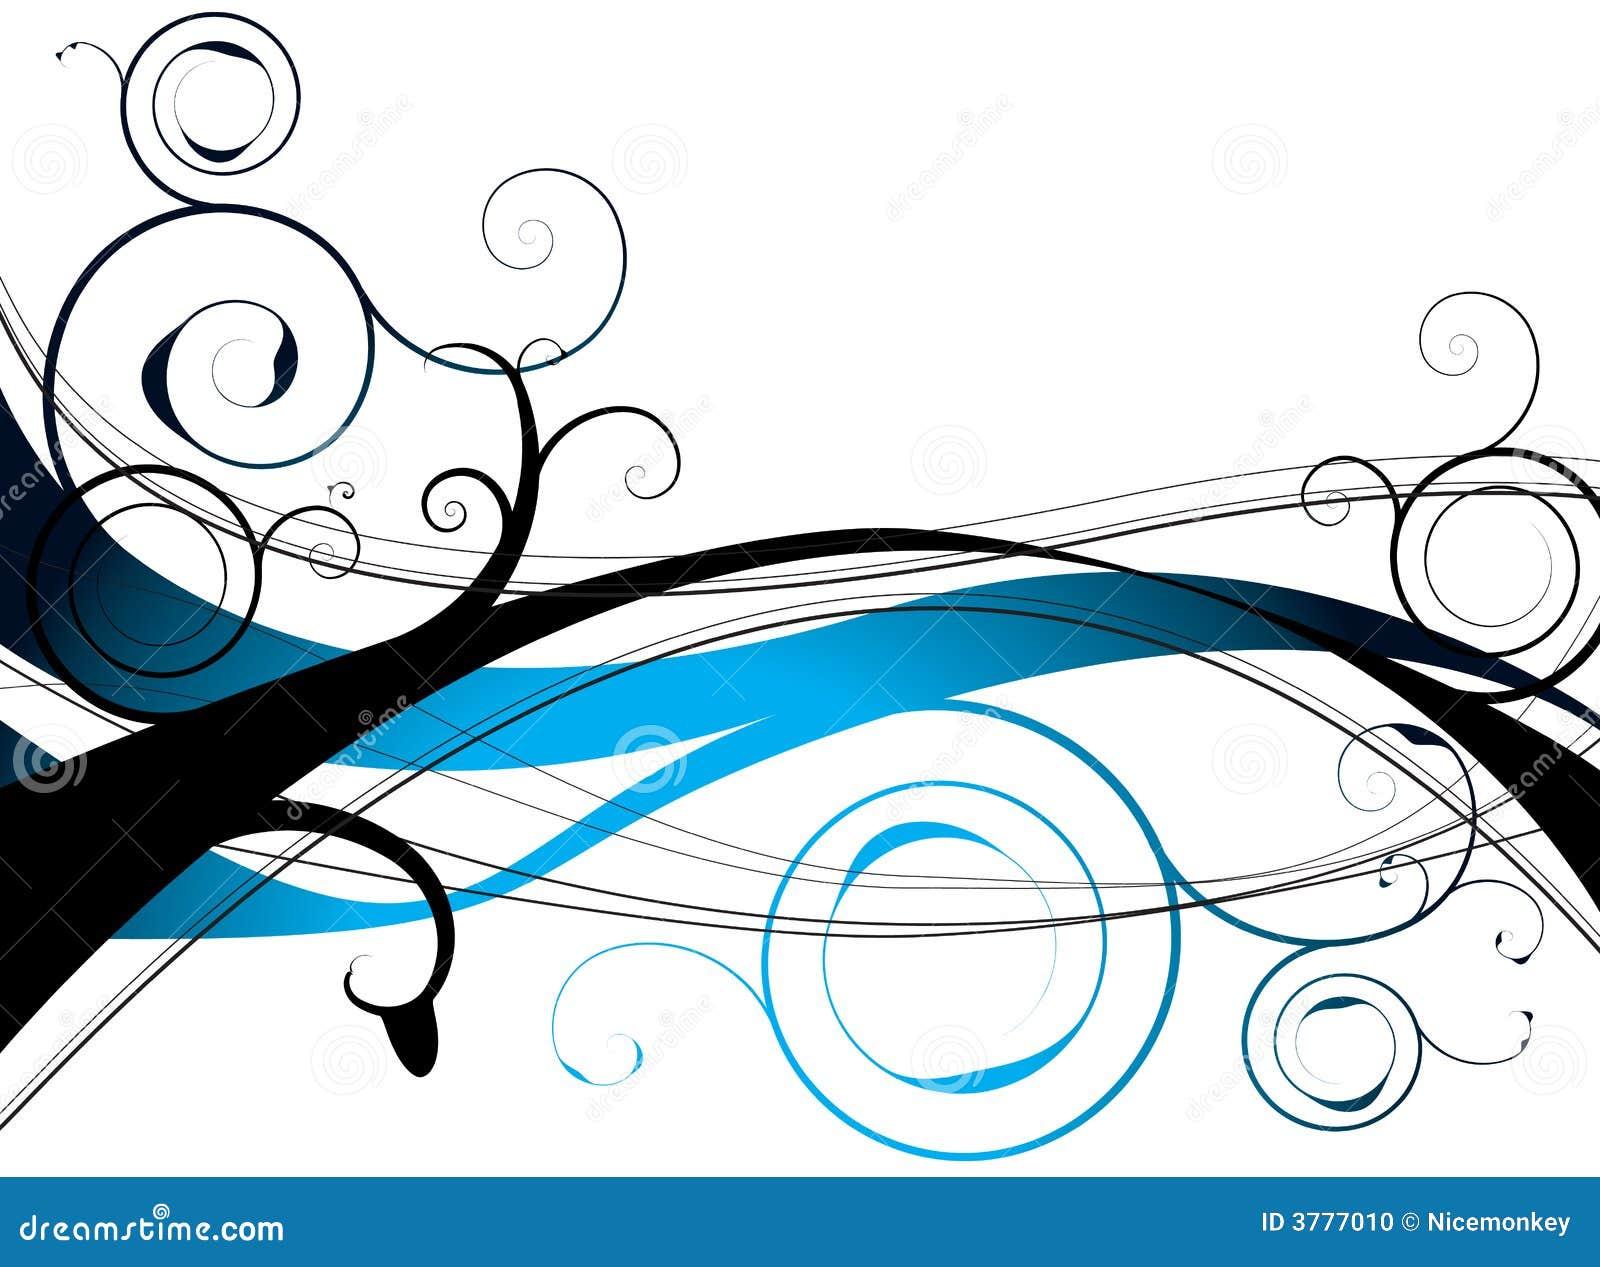 Blue floral swirl